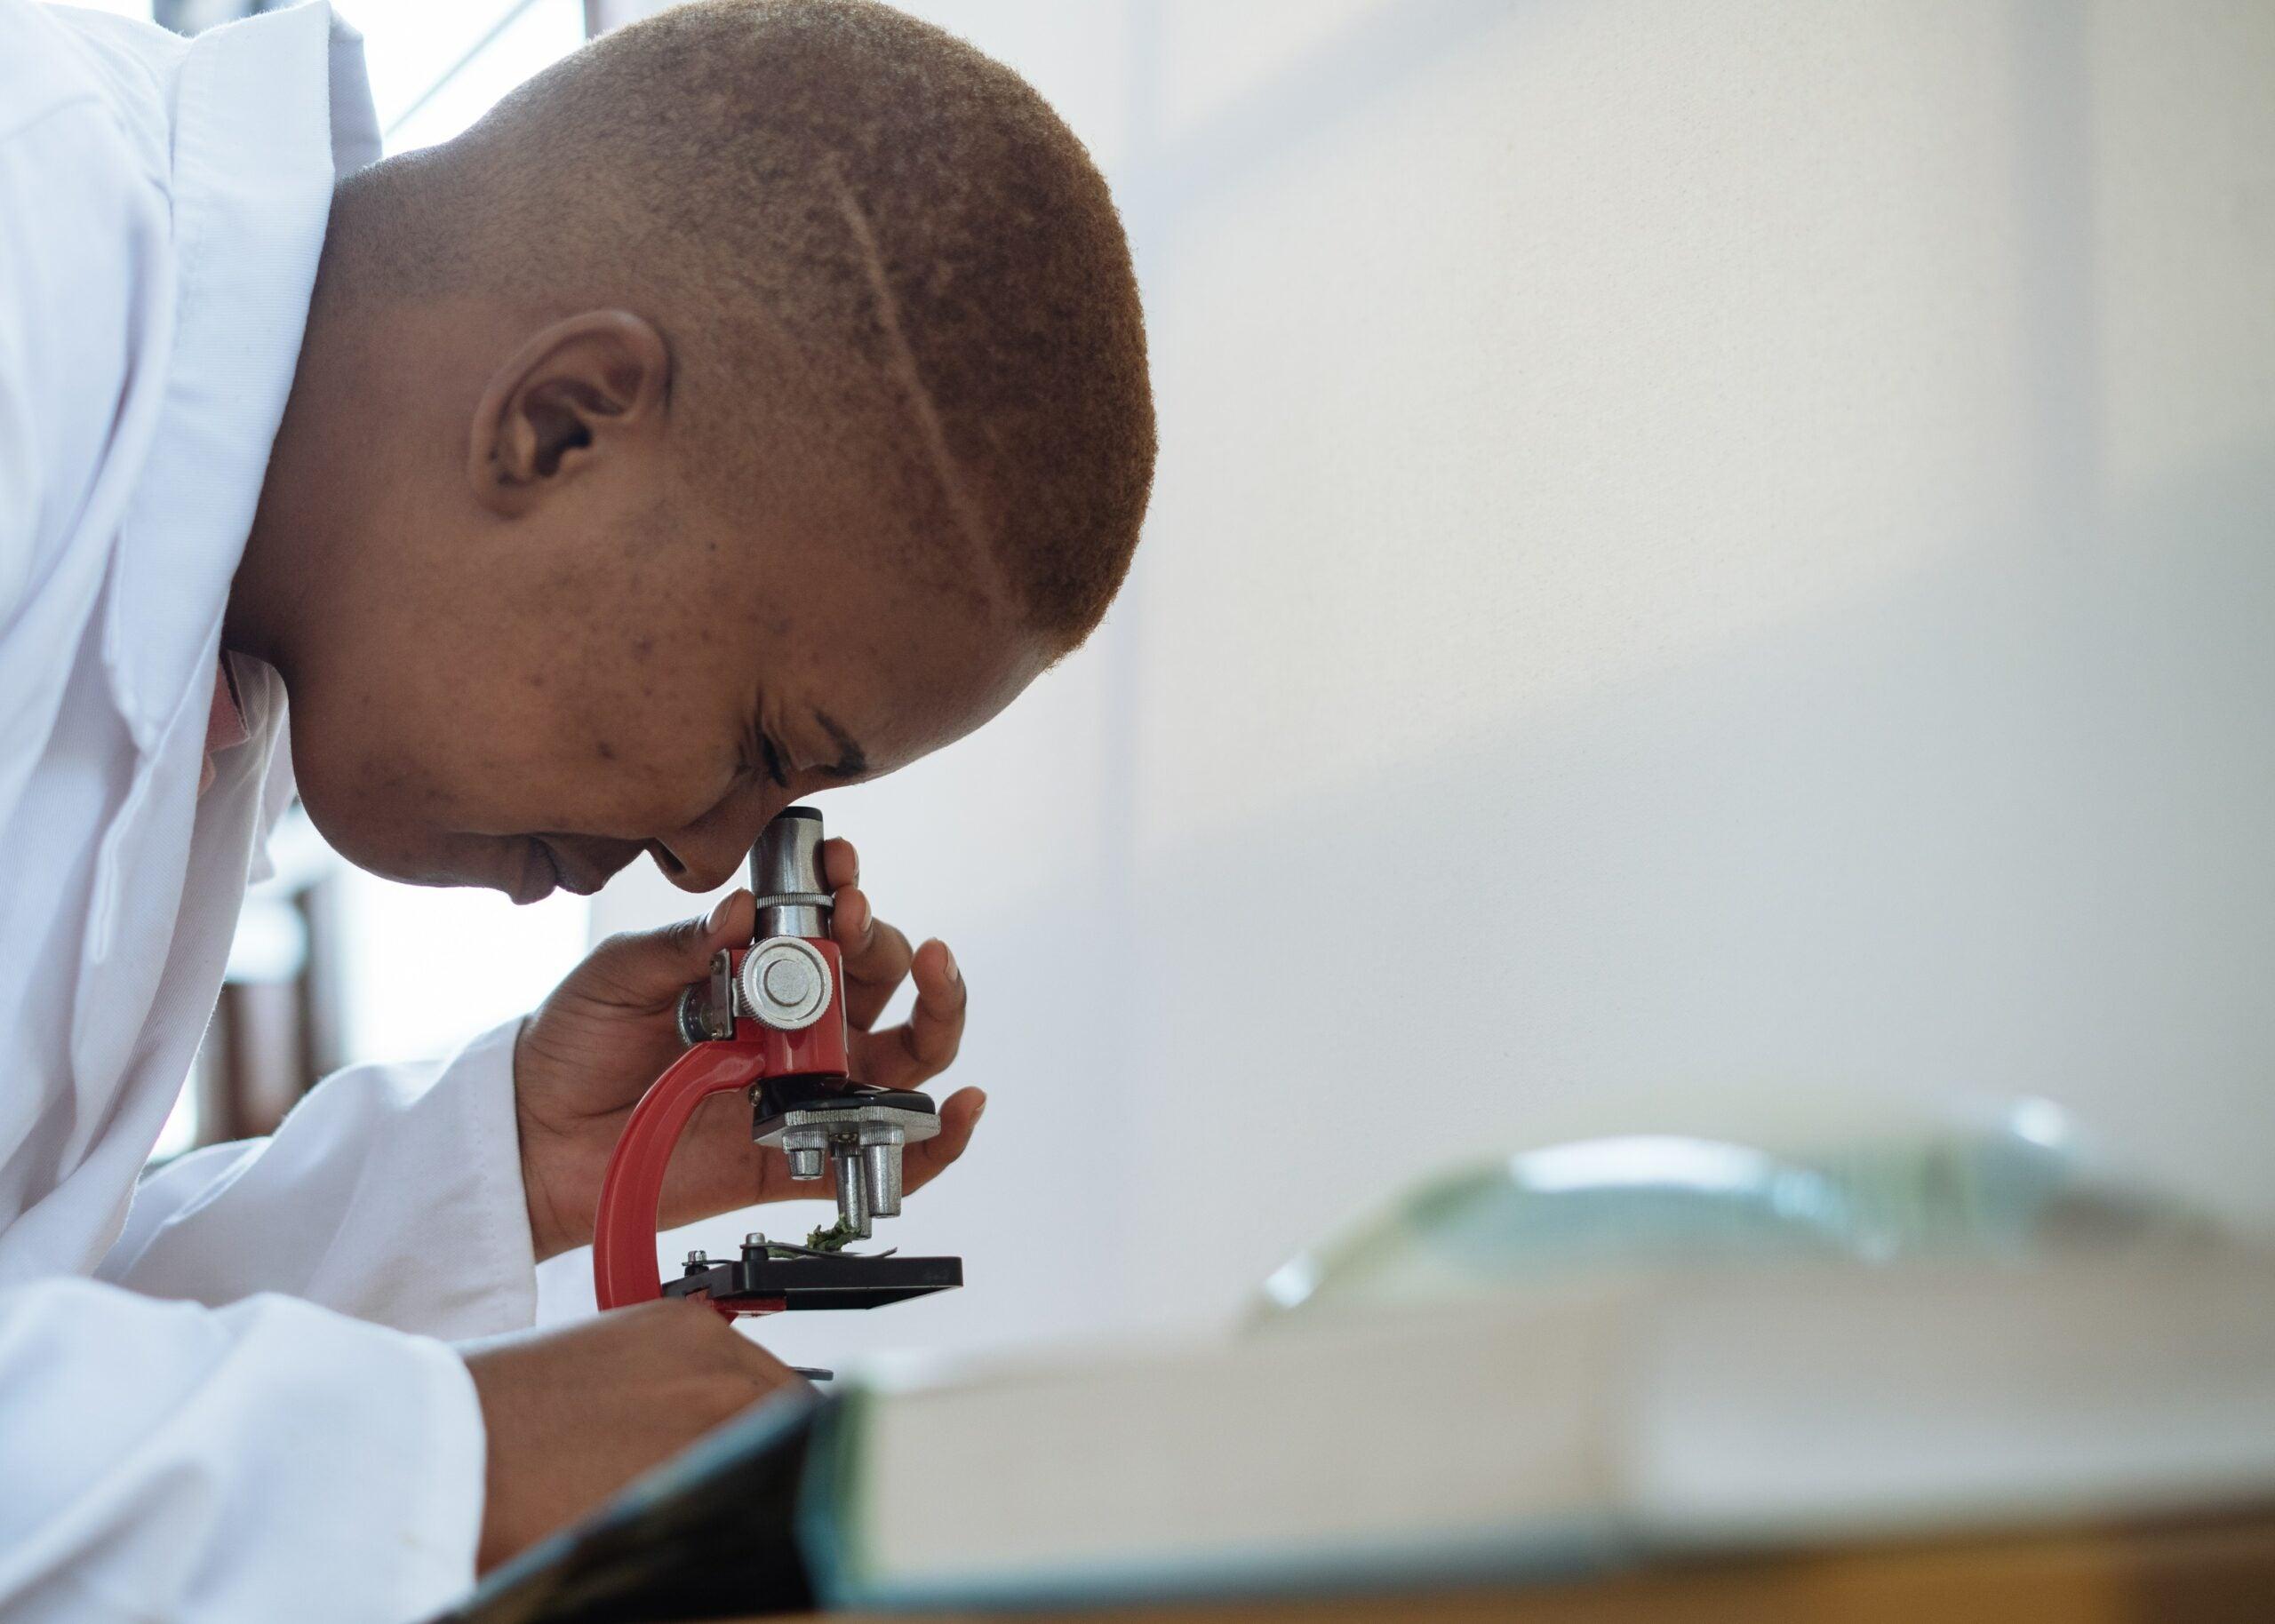 Laboratory scientist using microscope.